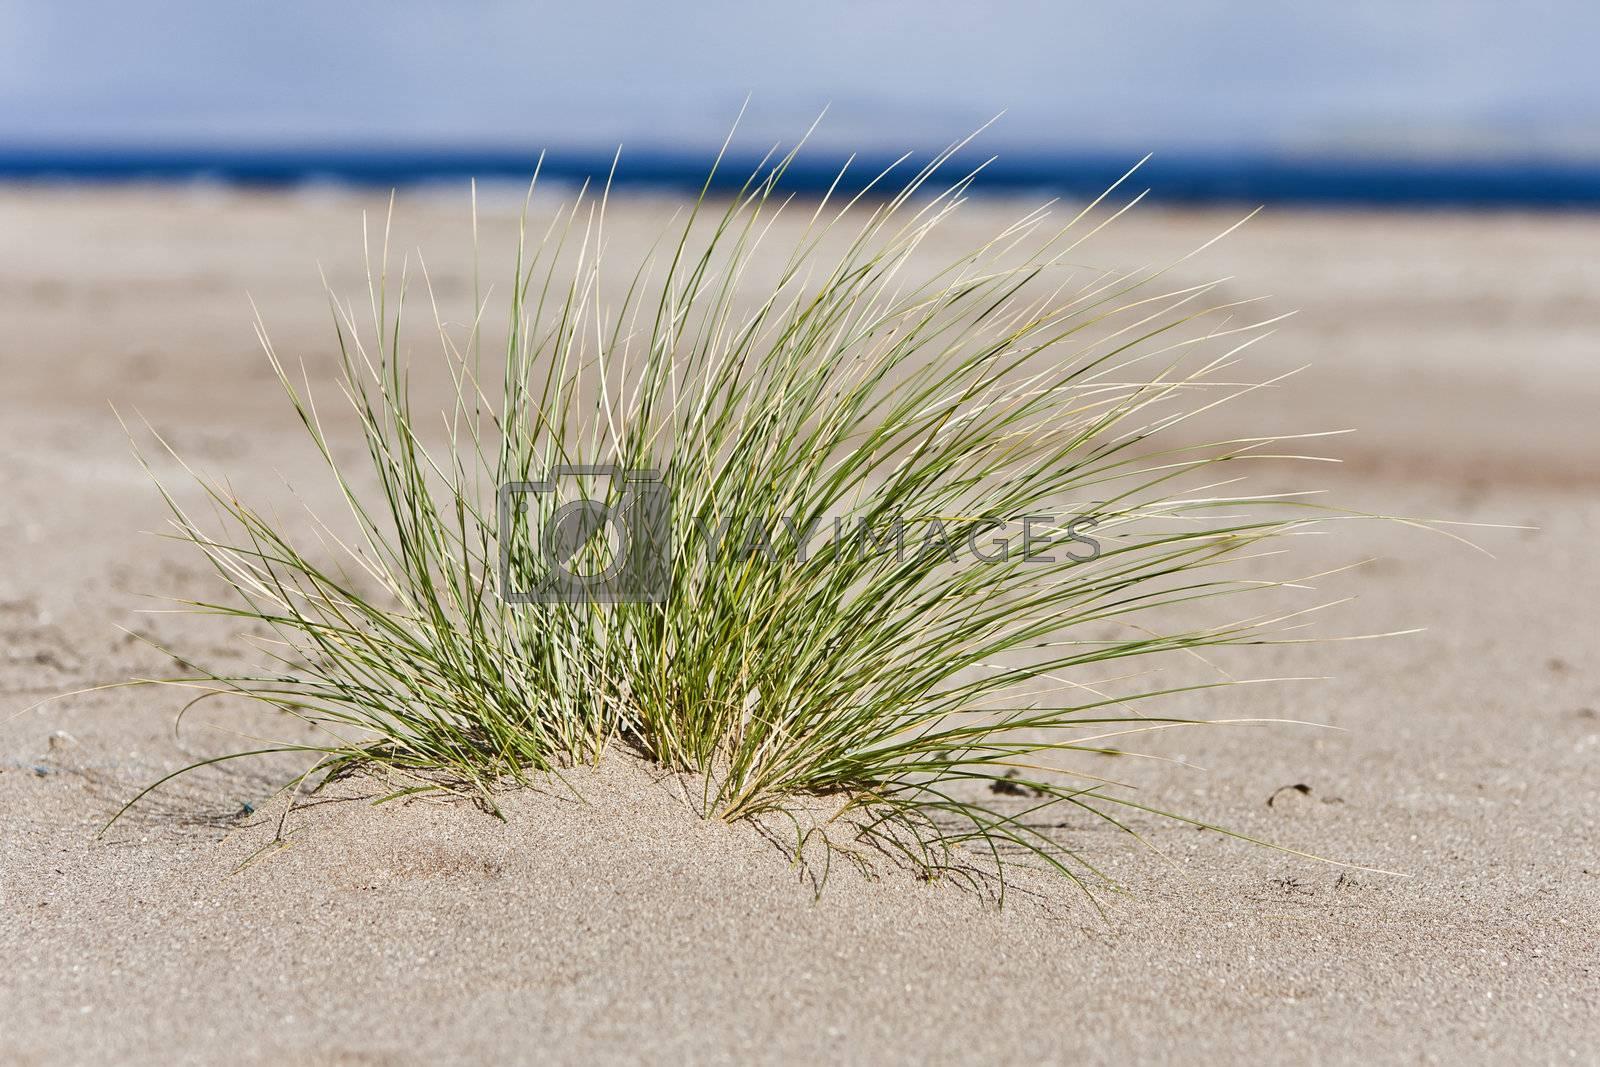 single hassock in sand at coastline. horizontal image